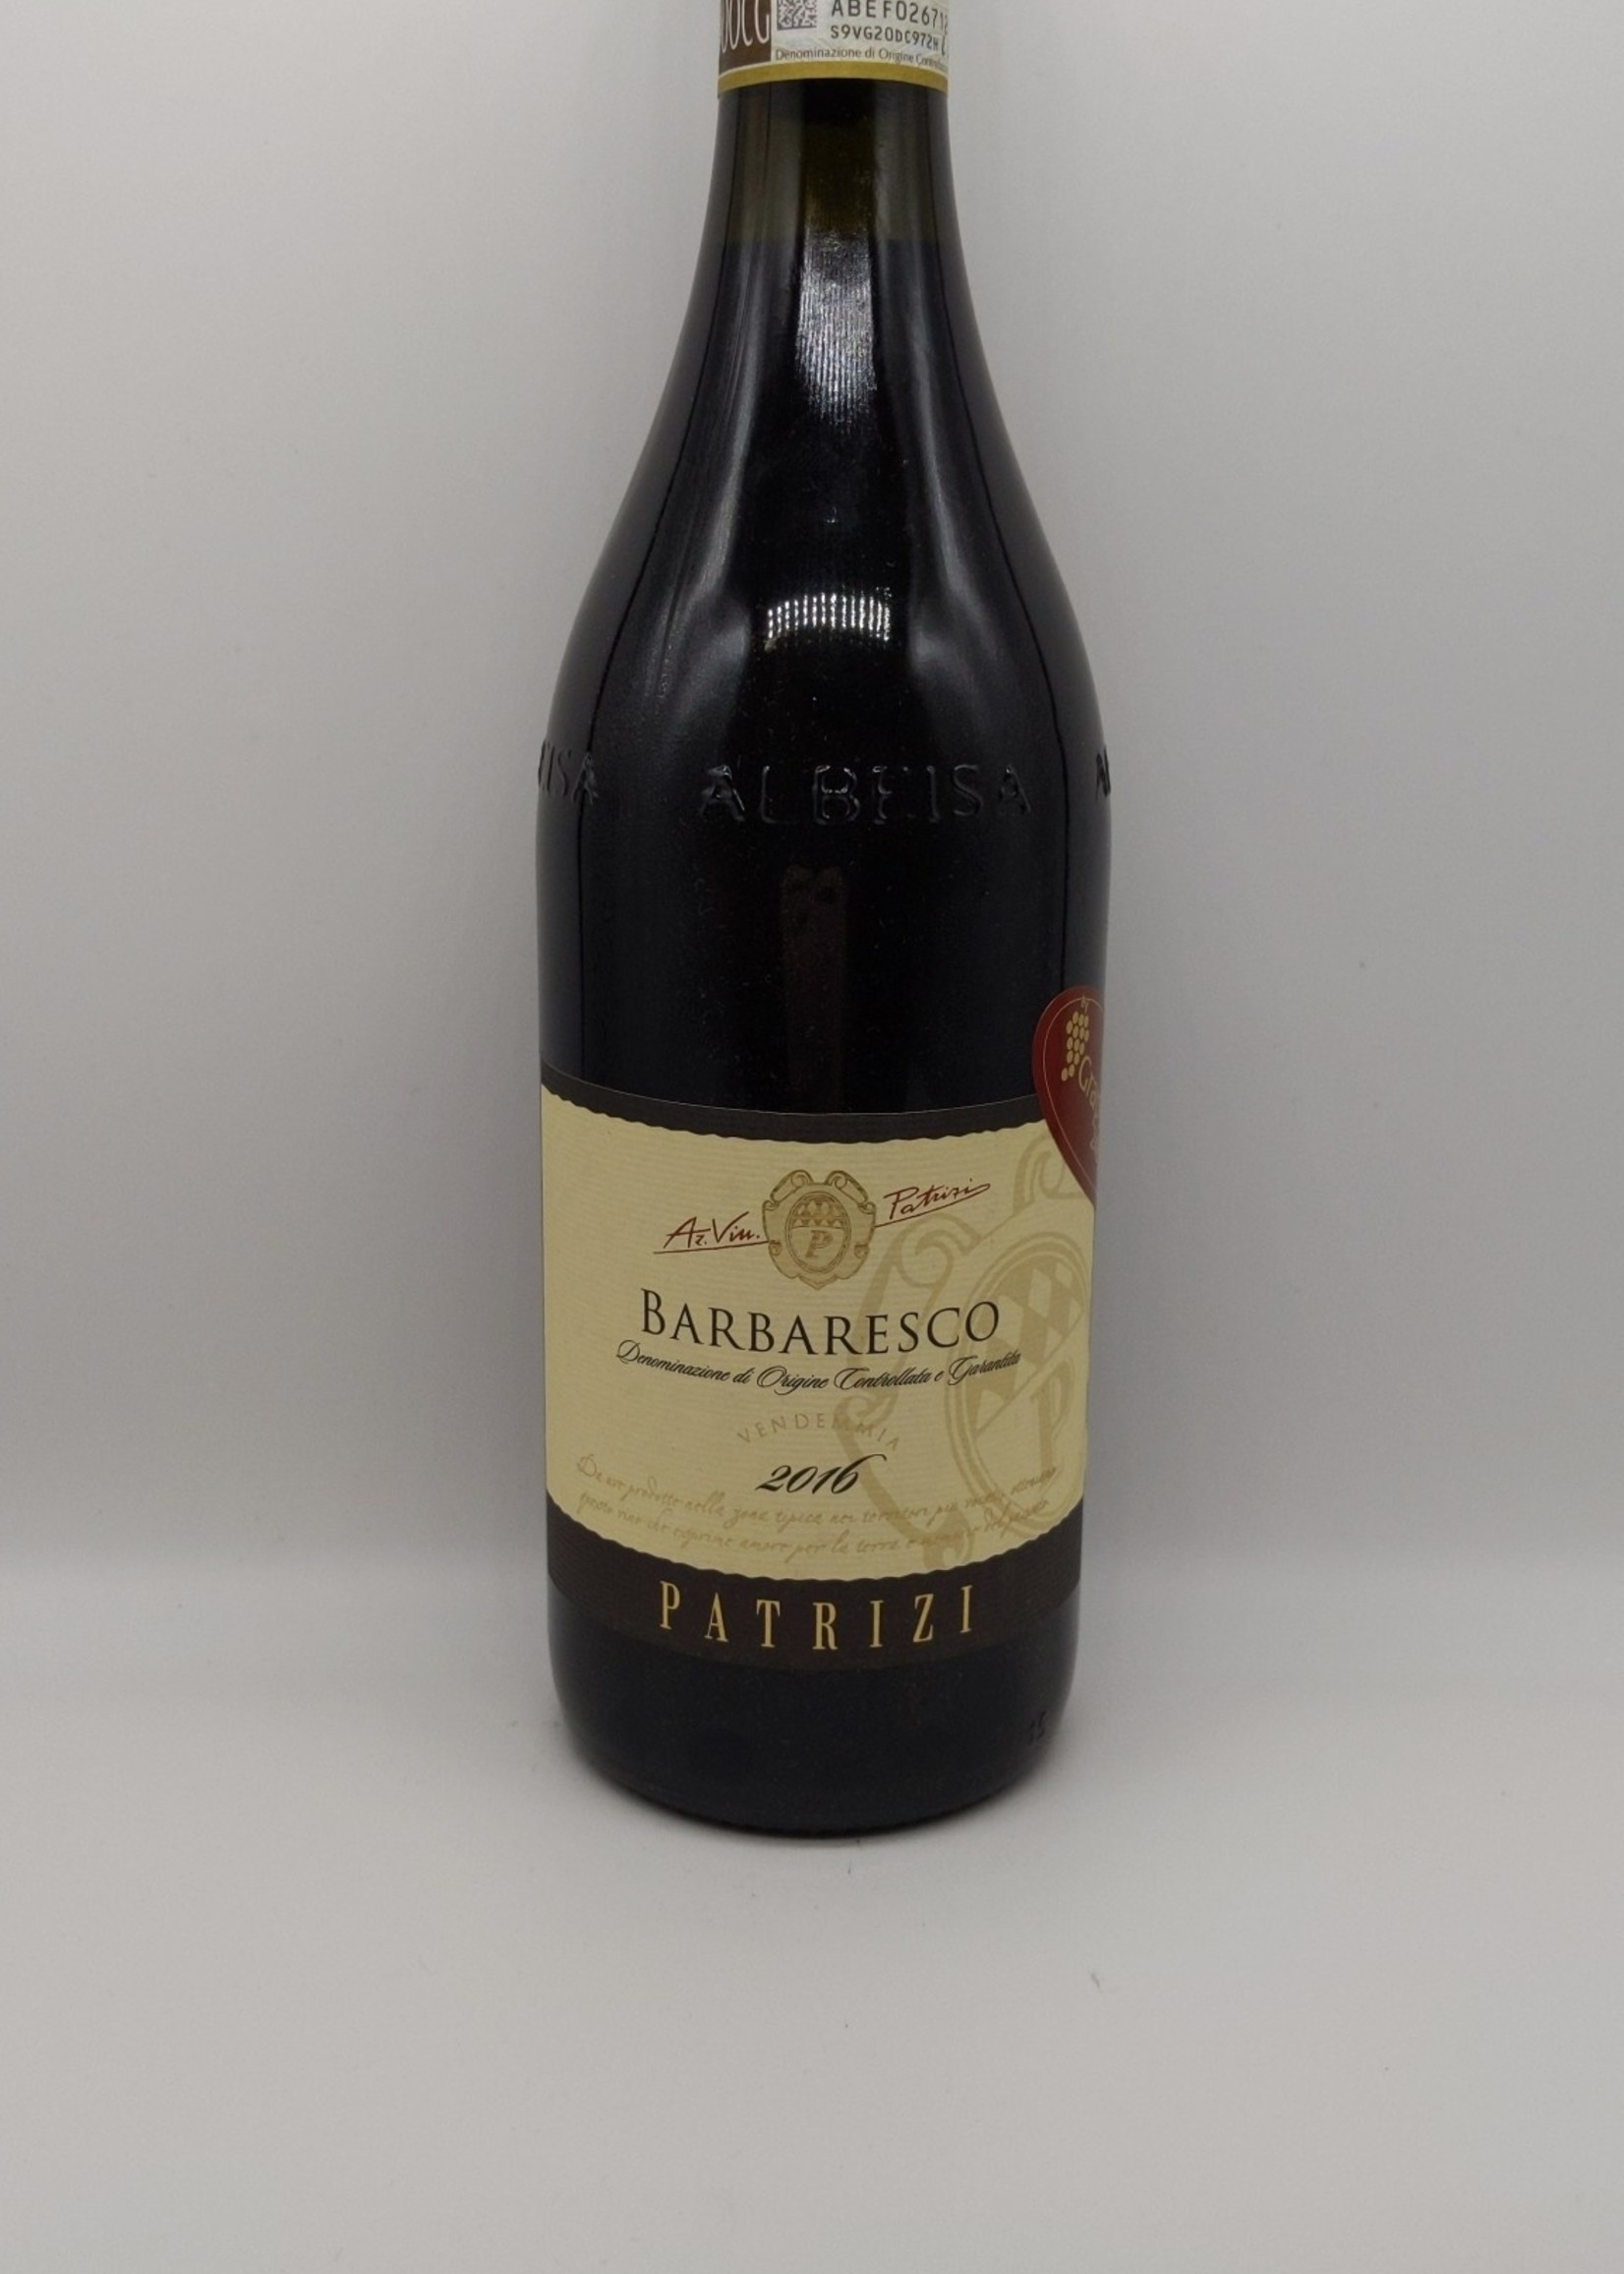 2016 PATRIZI BARBARESCO 750ml